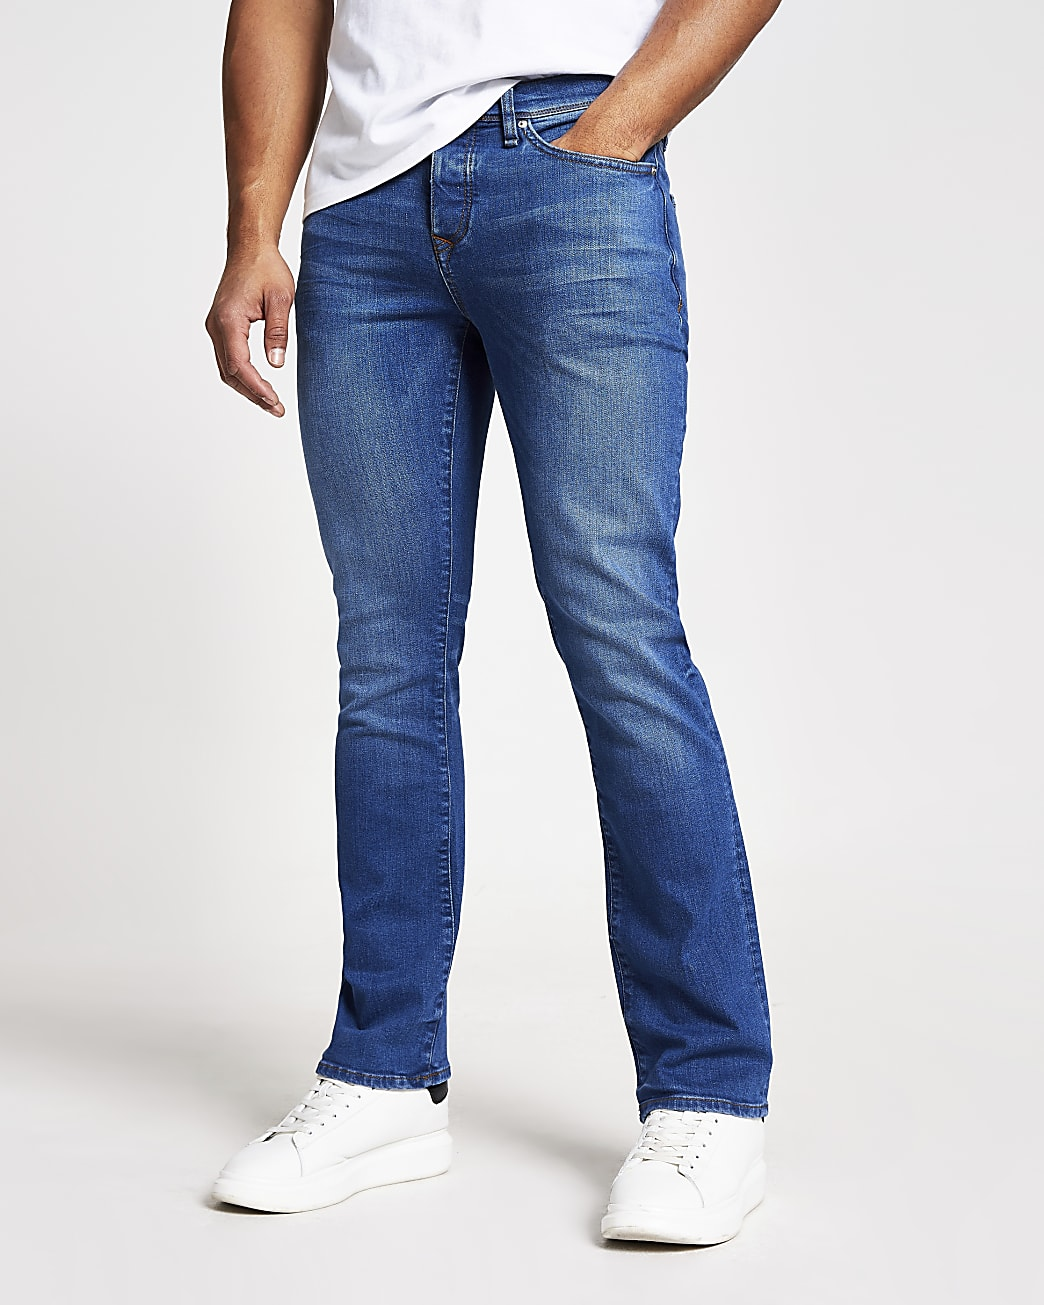 Blue bootcut fit jeans